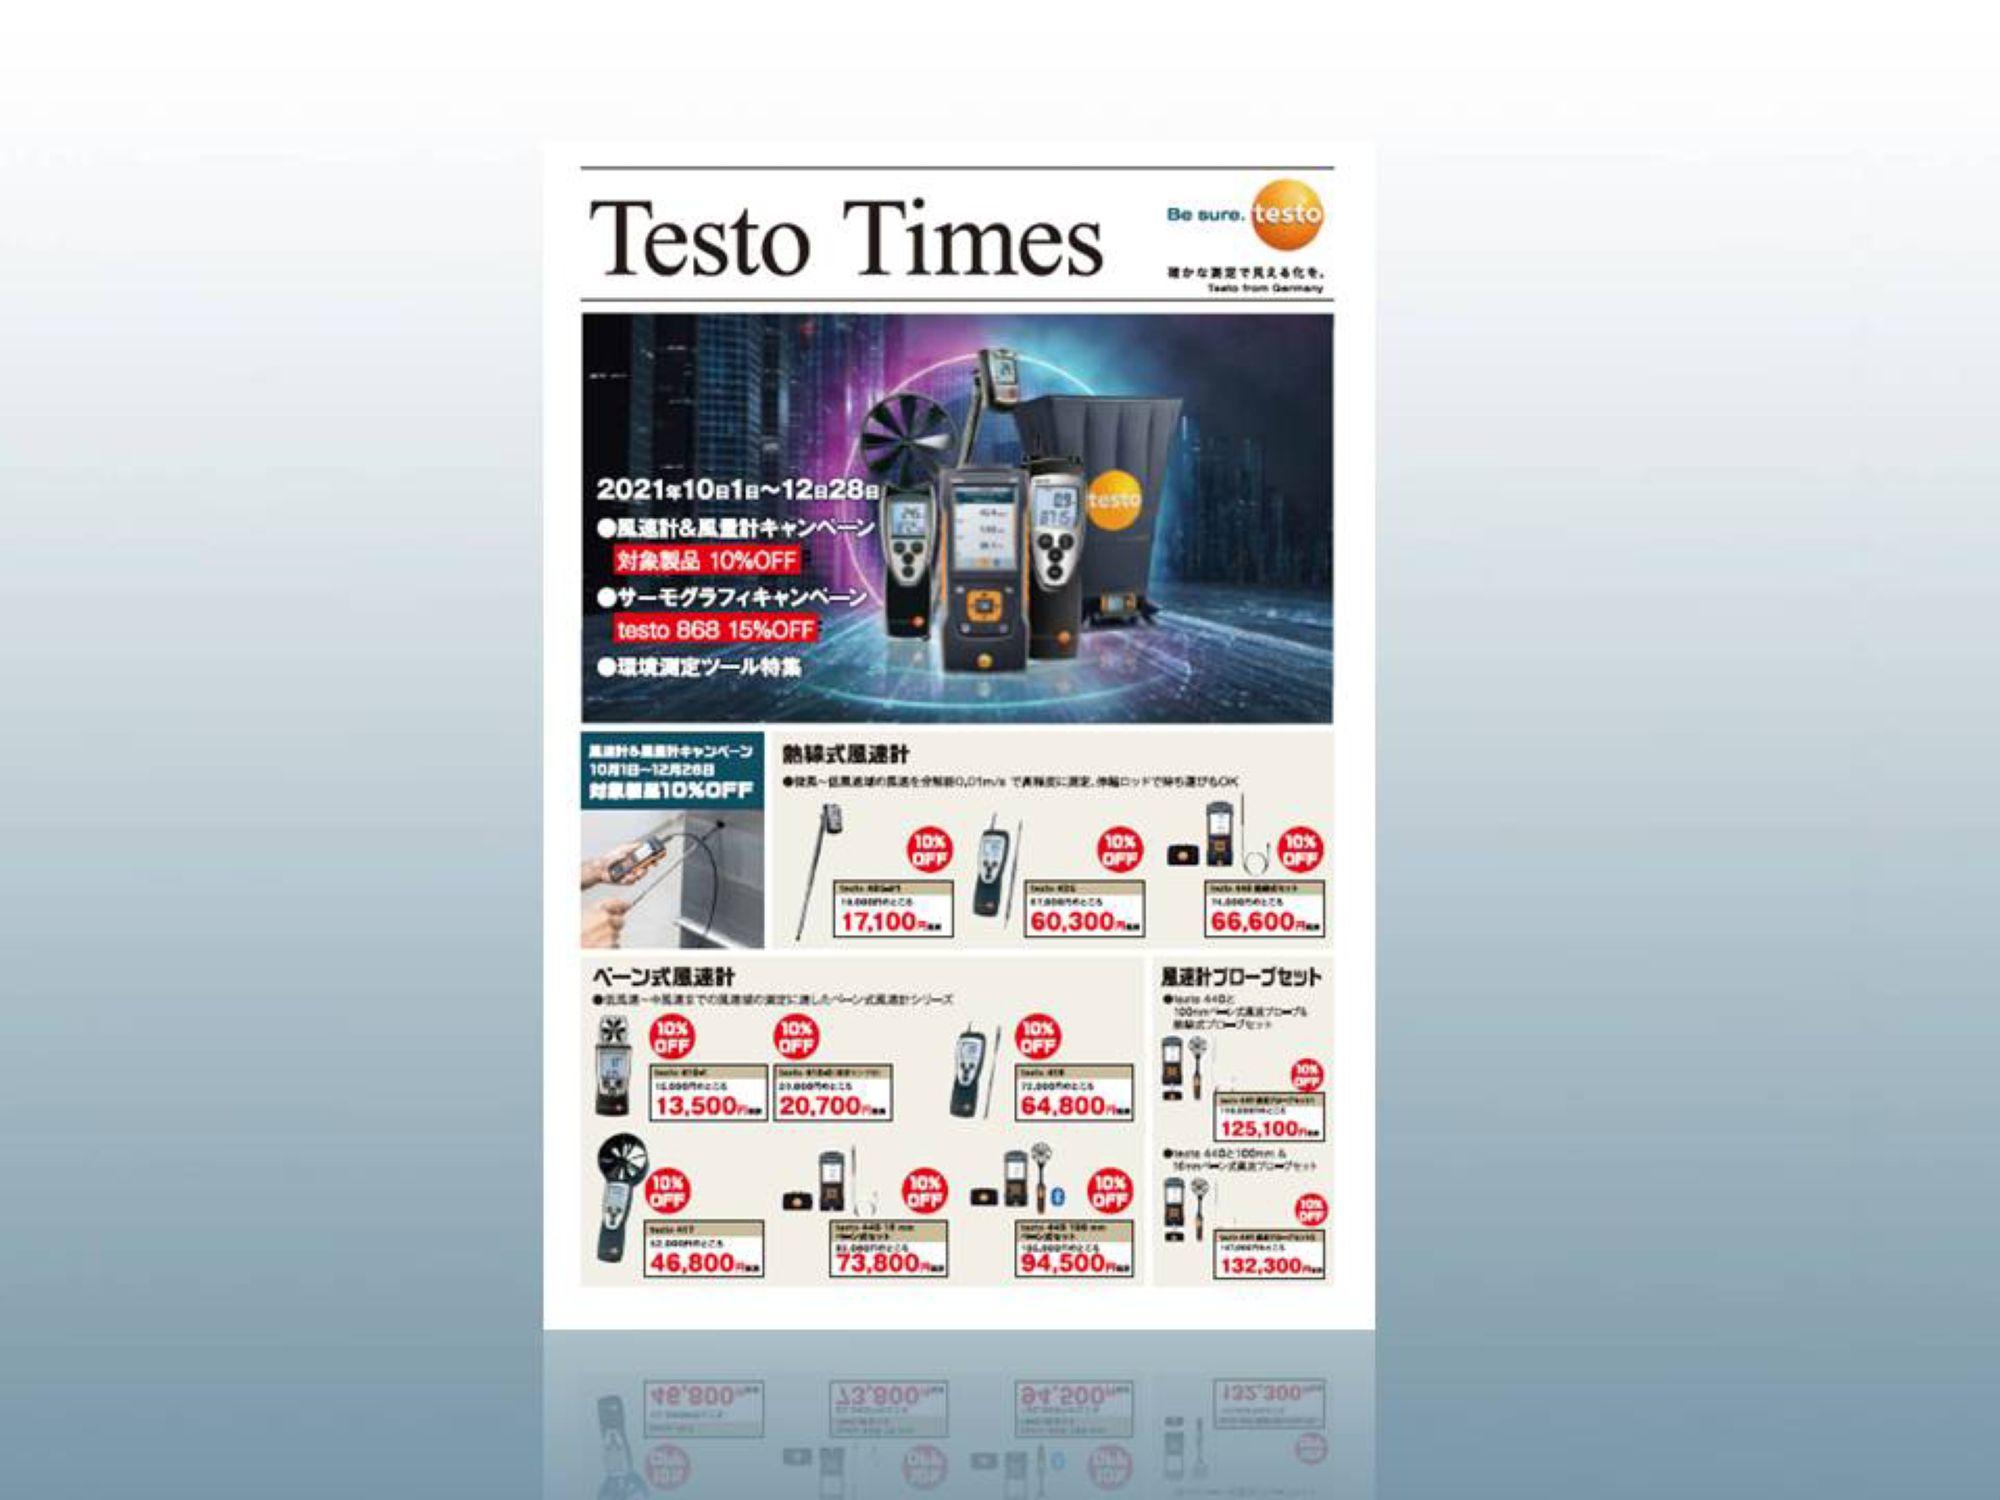 jp_testo times1_ClimateCP_2021_thumbnail.png